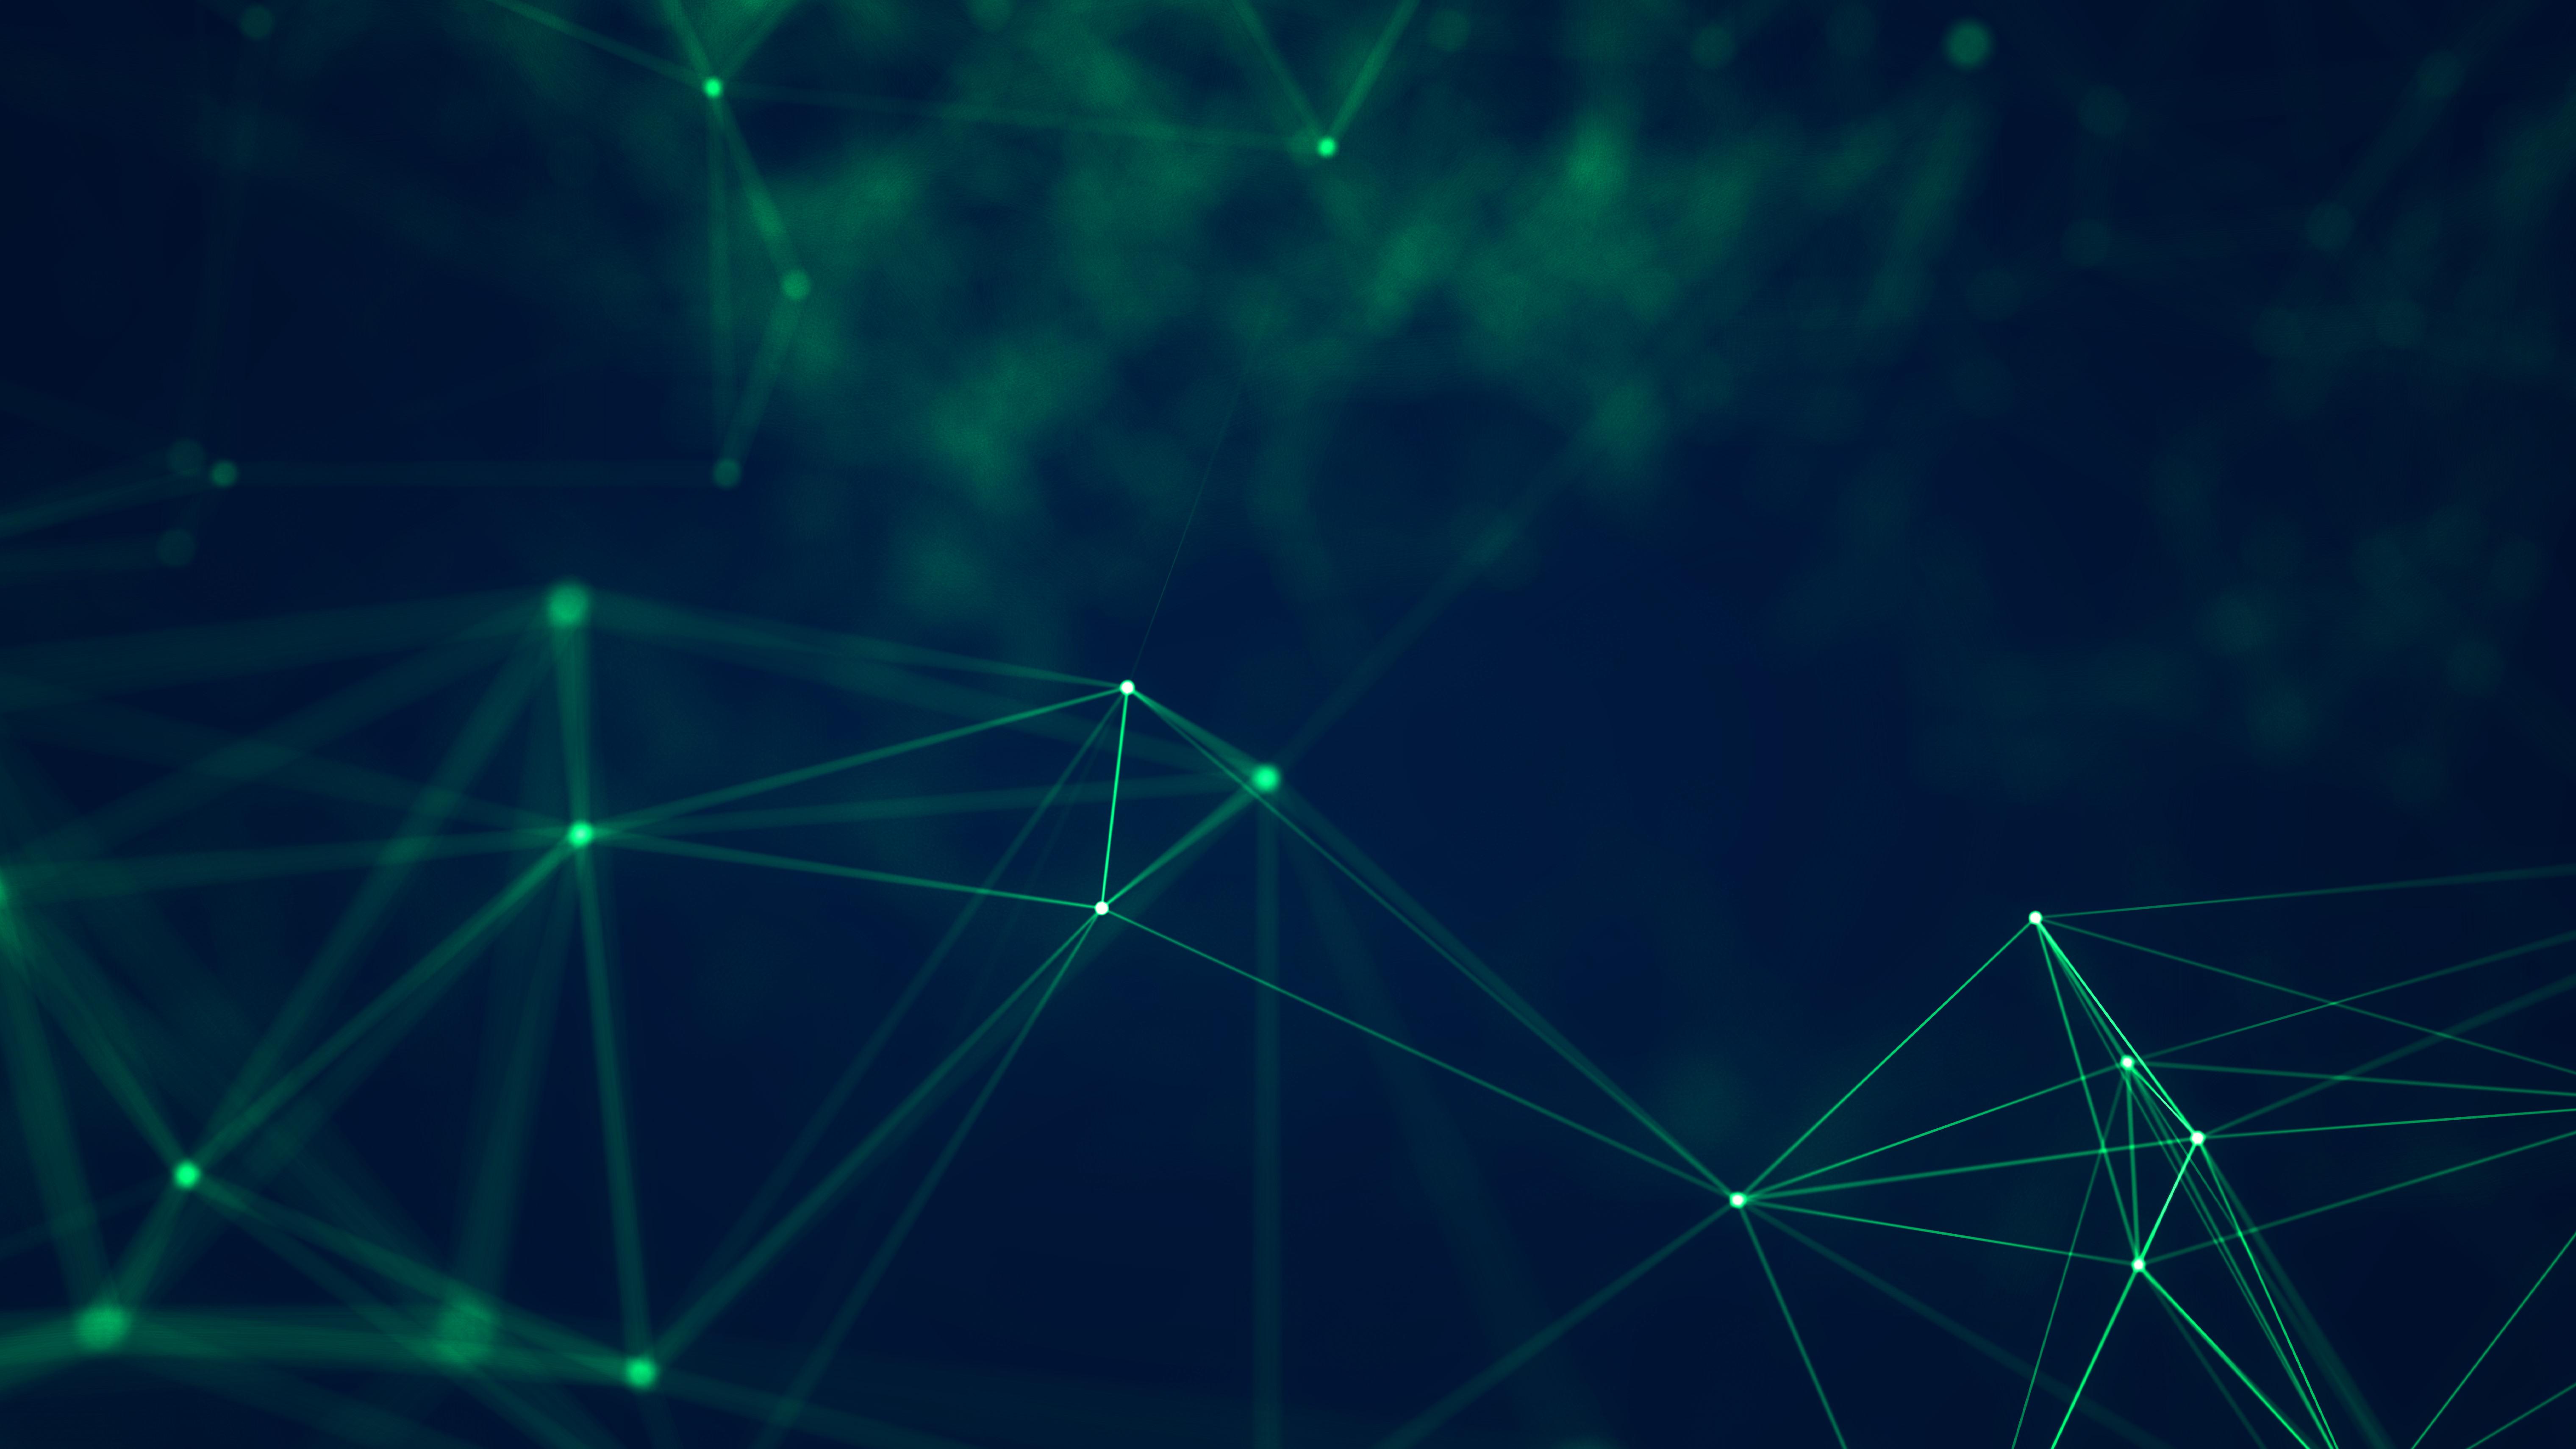 General 6080x3420 geometry cyberspace digital art green lines abstract